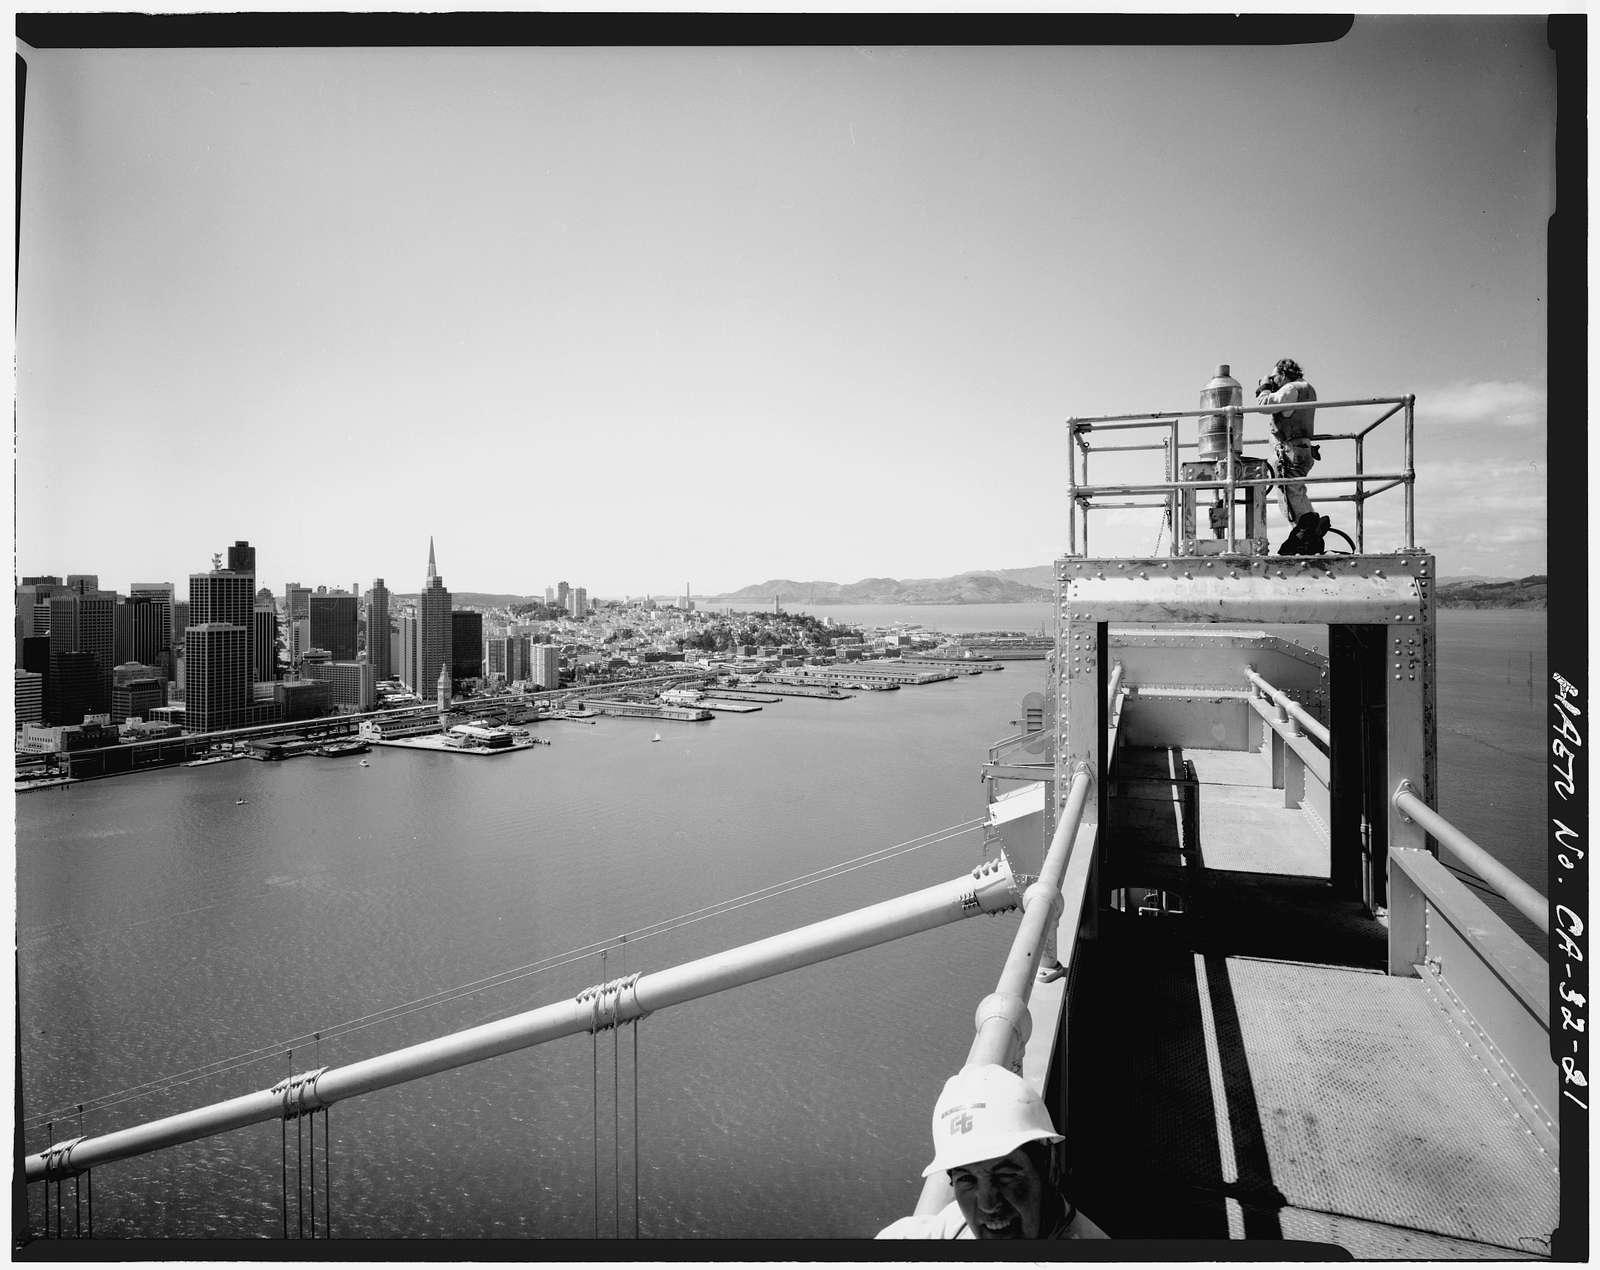 San Francisco Oakland Bay Bridge, Spanning San Francisco Bay, San Francisco, San Francisco County, CA